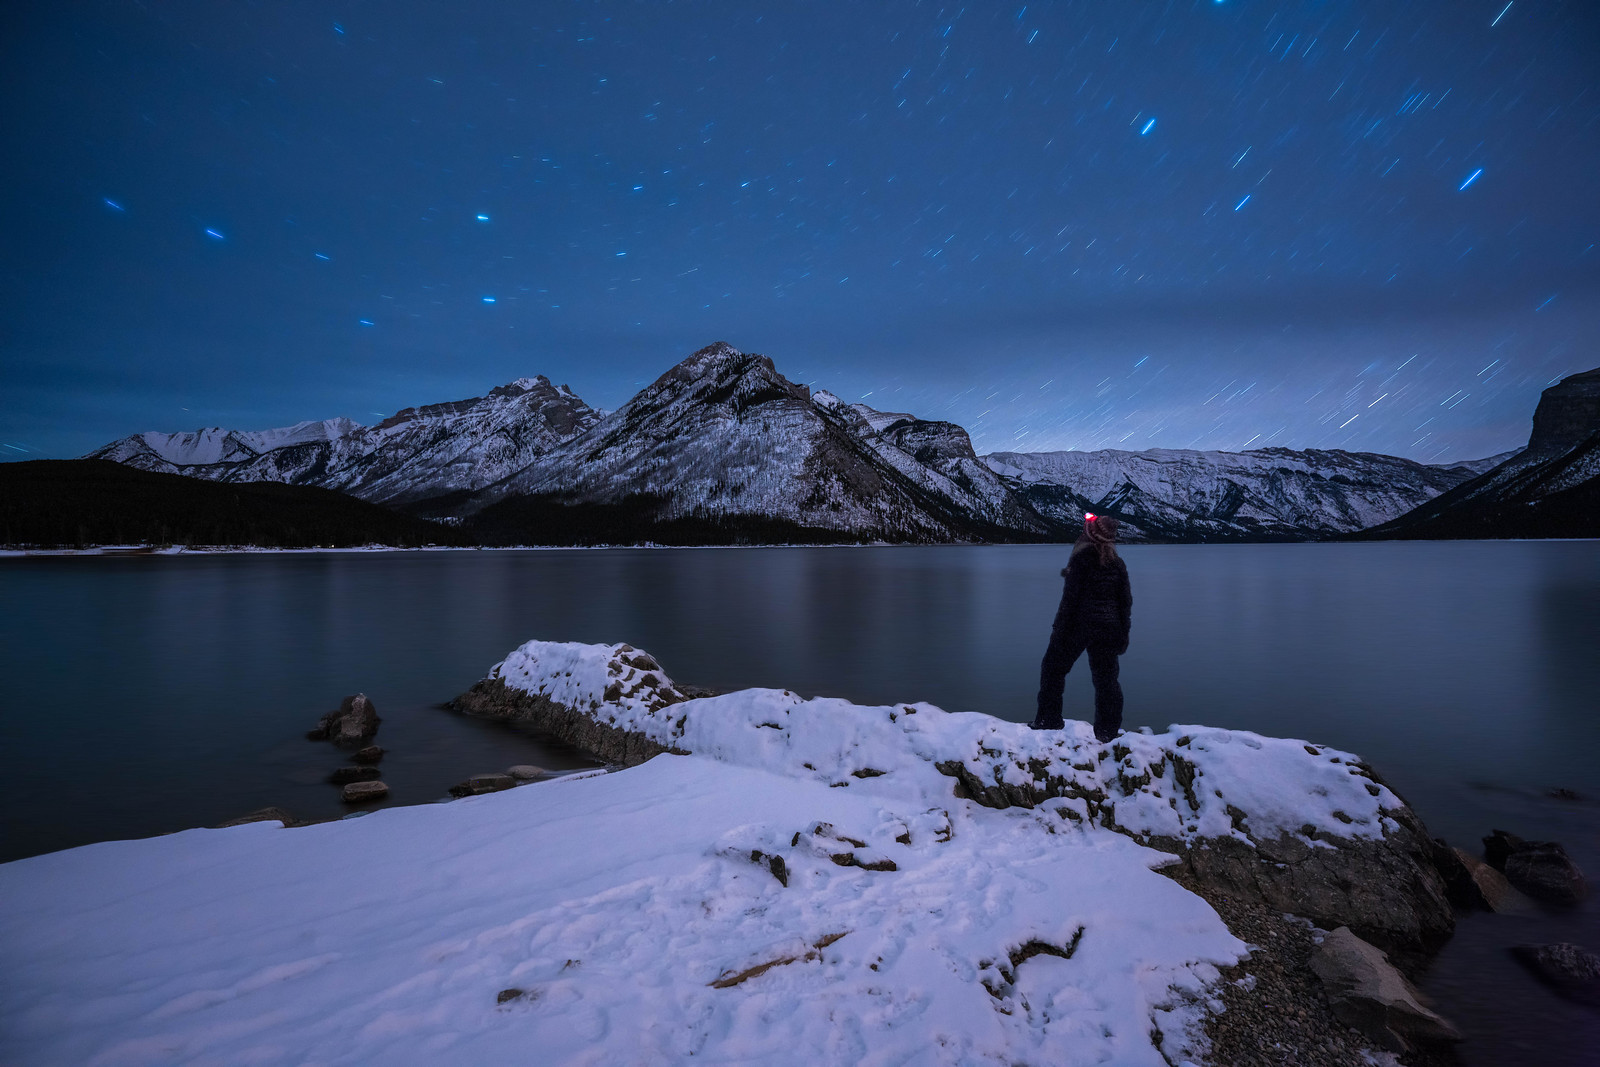 Stargazing on Lake Minnewanka in Banff National Park in Canada